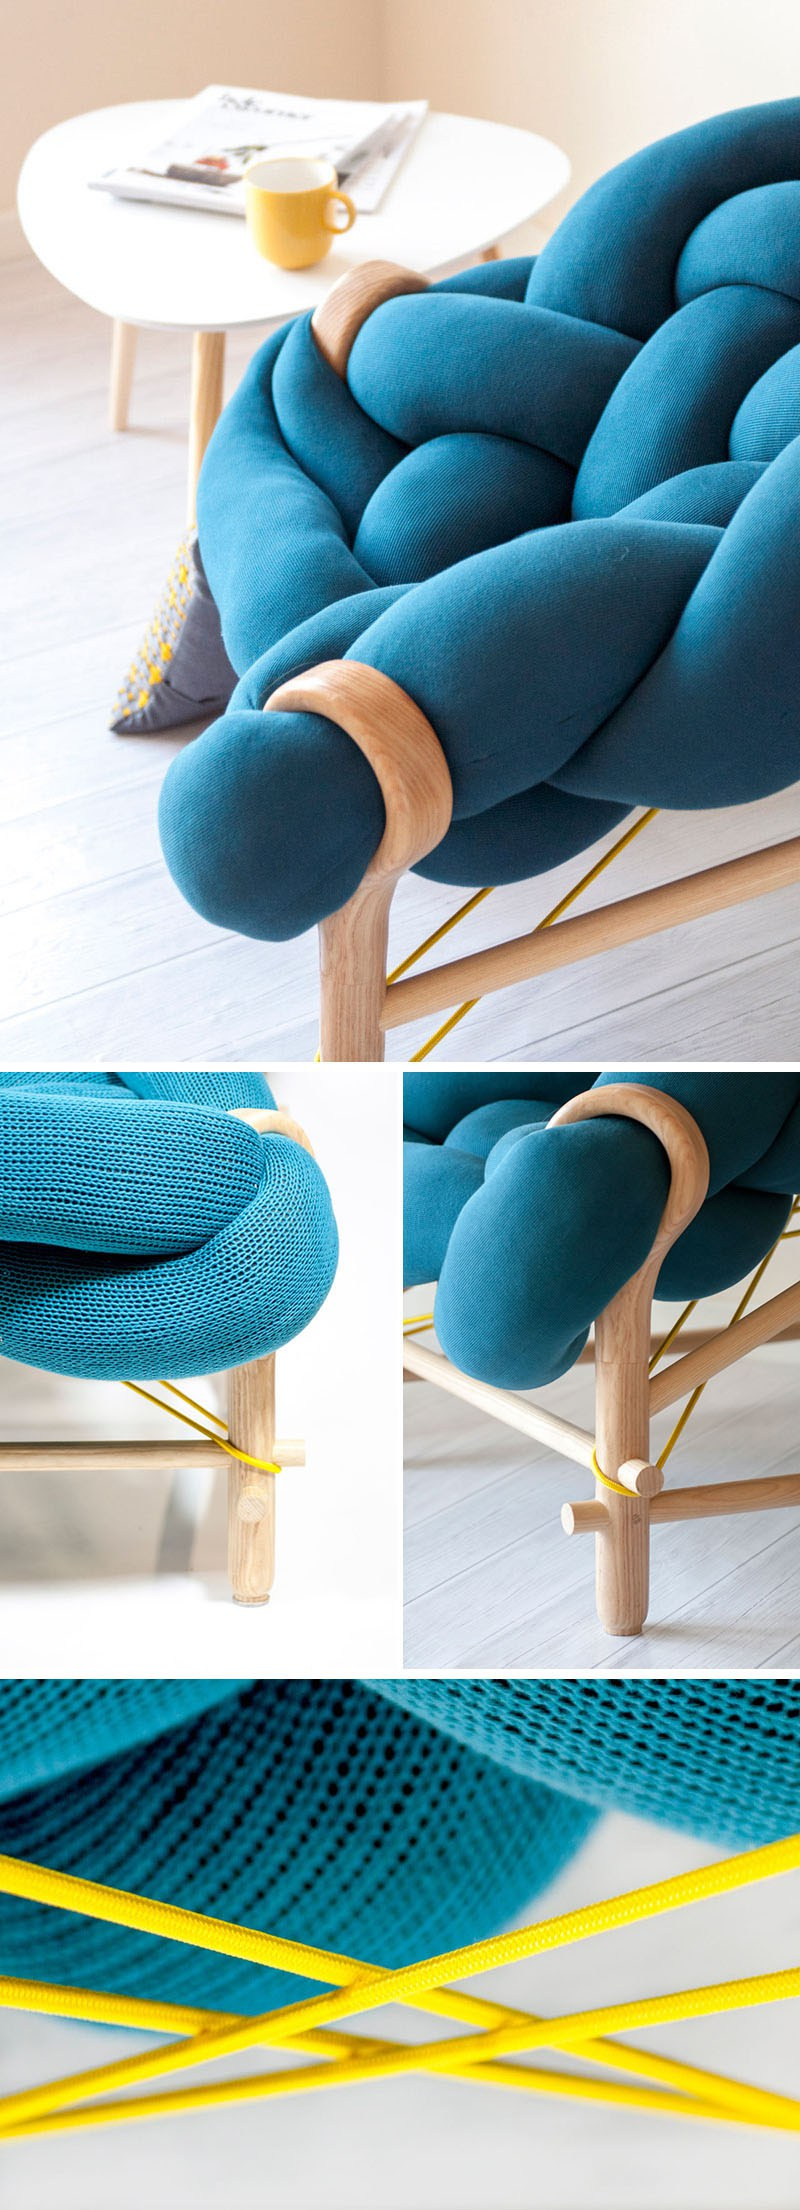 meubles-tisses-et-tricotes4_veegadesign_cd-mentiel-magazine